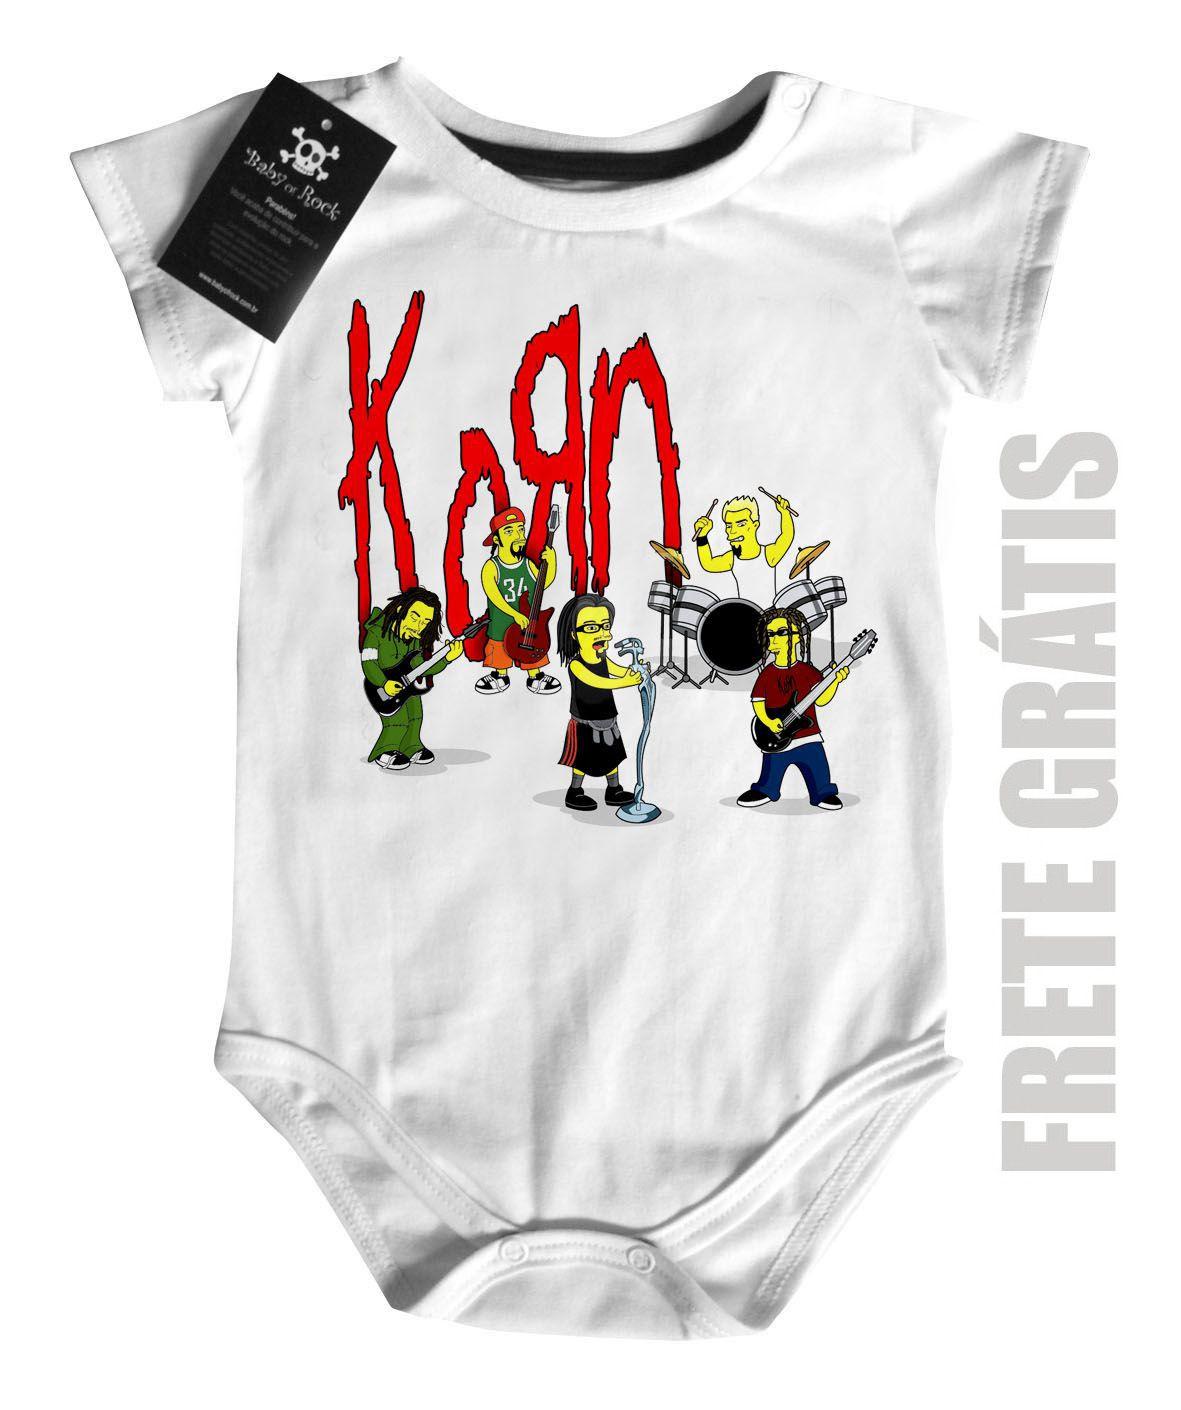 Body Bebe de  Rock Baby-  Korn Simpsons - White  - Baby Monster S/A